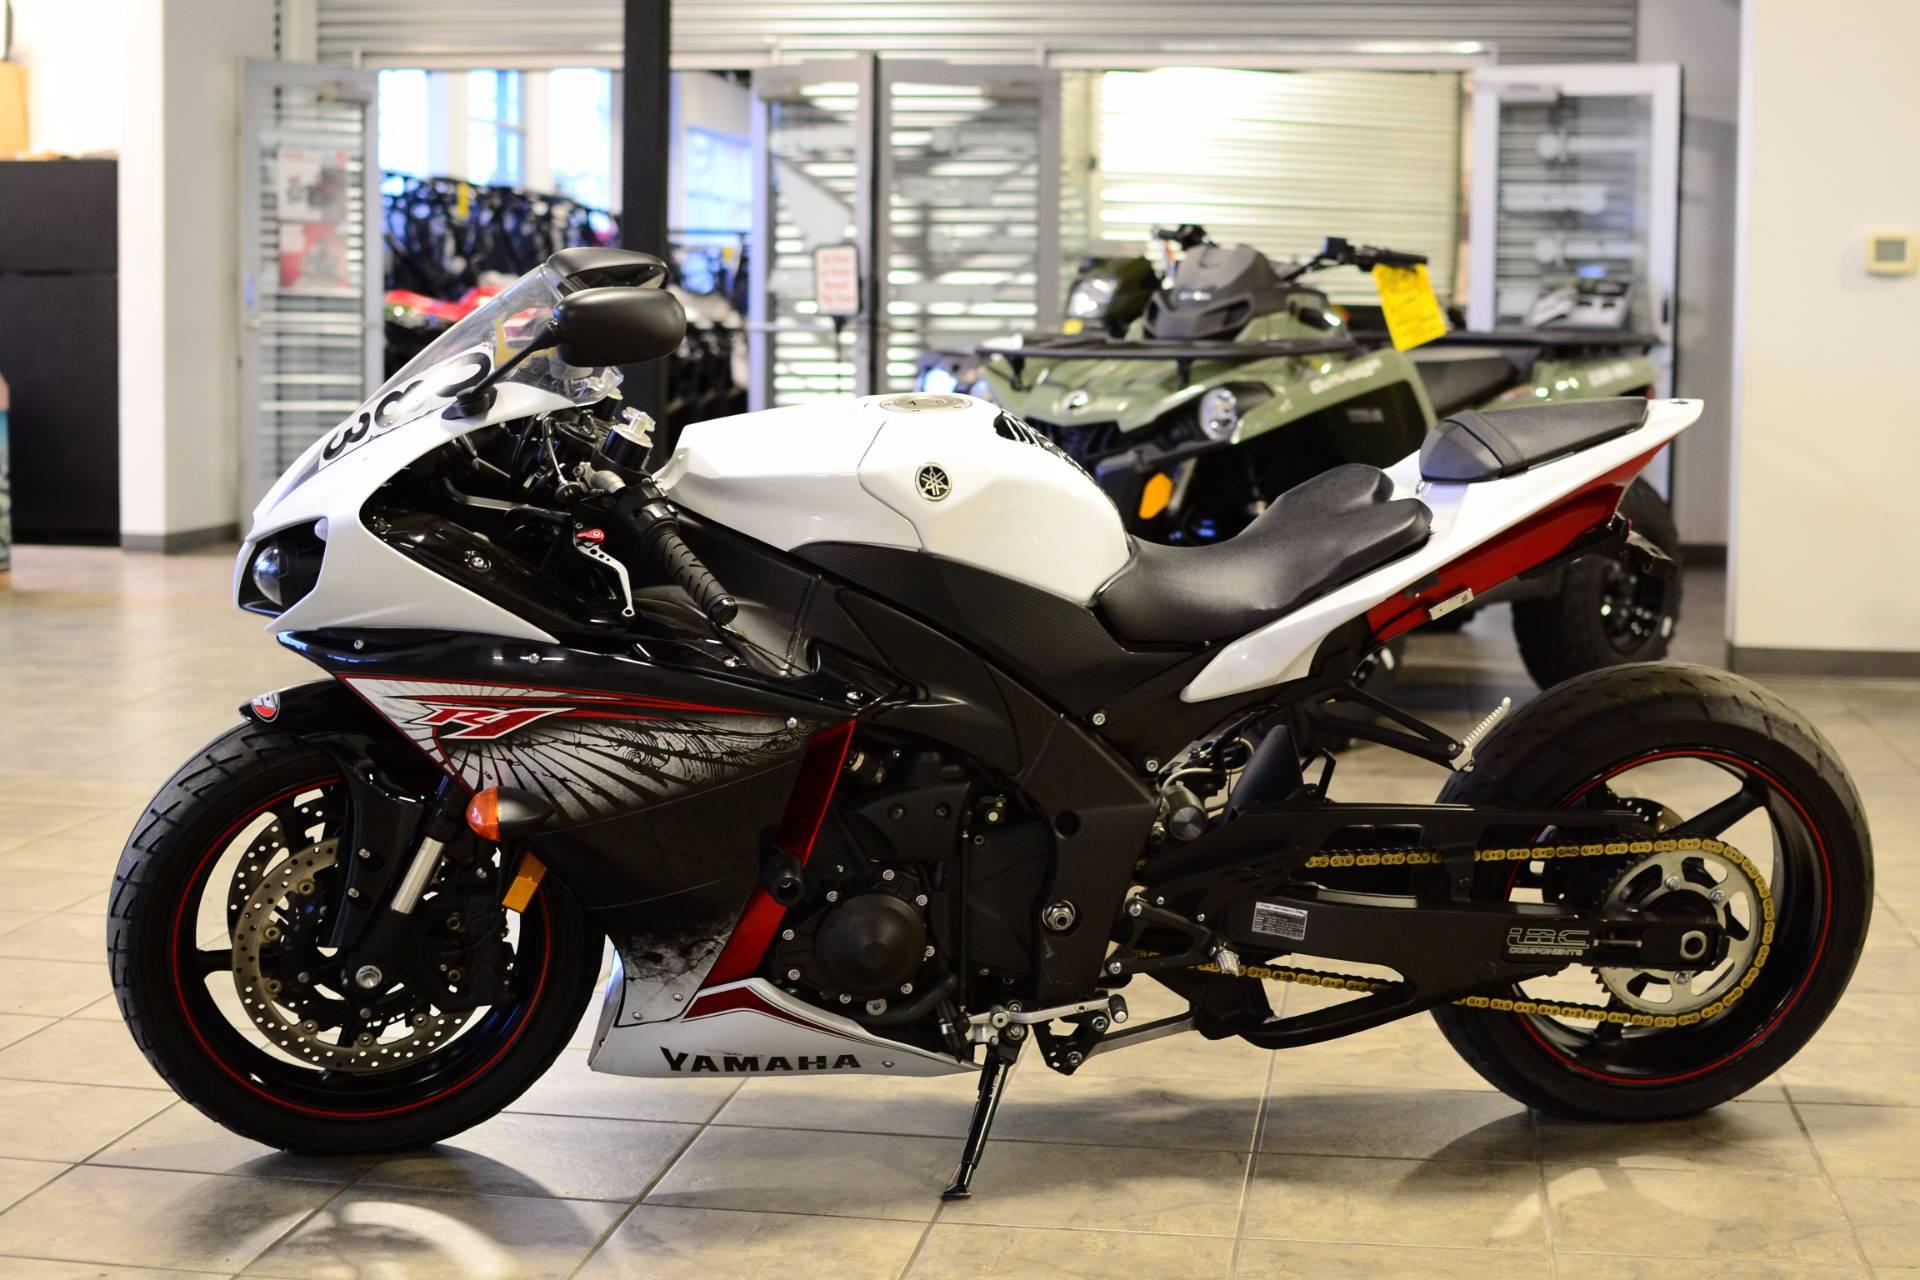 2012 Yamaha YZF-R1 3